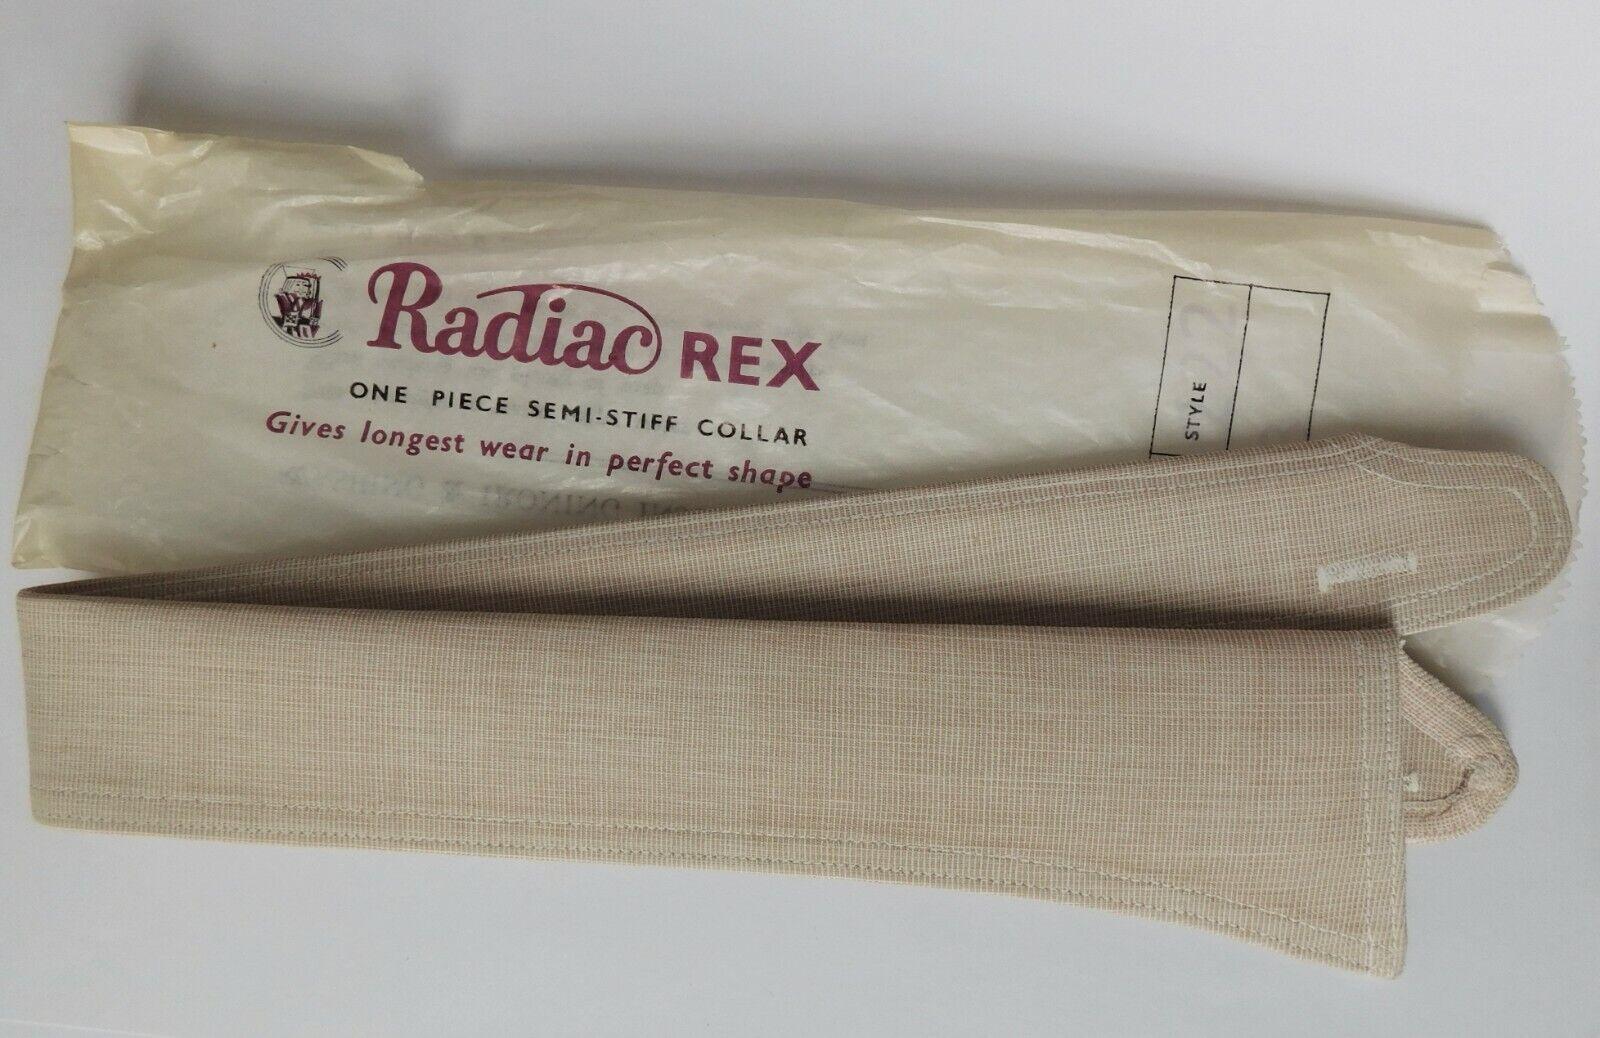 Radiac Rex shirt collar size 18 beige buff semi-stiff UNUSED vintage detachable